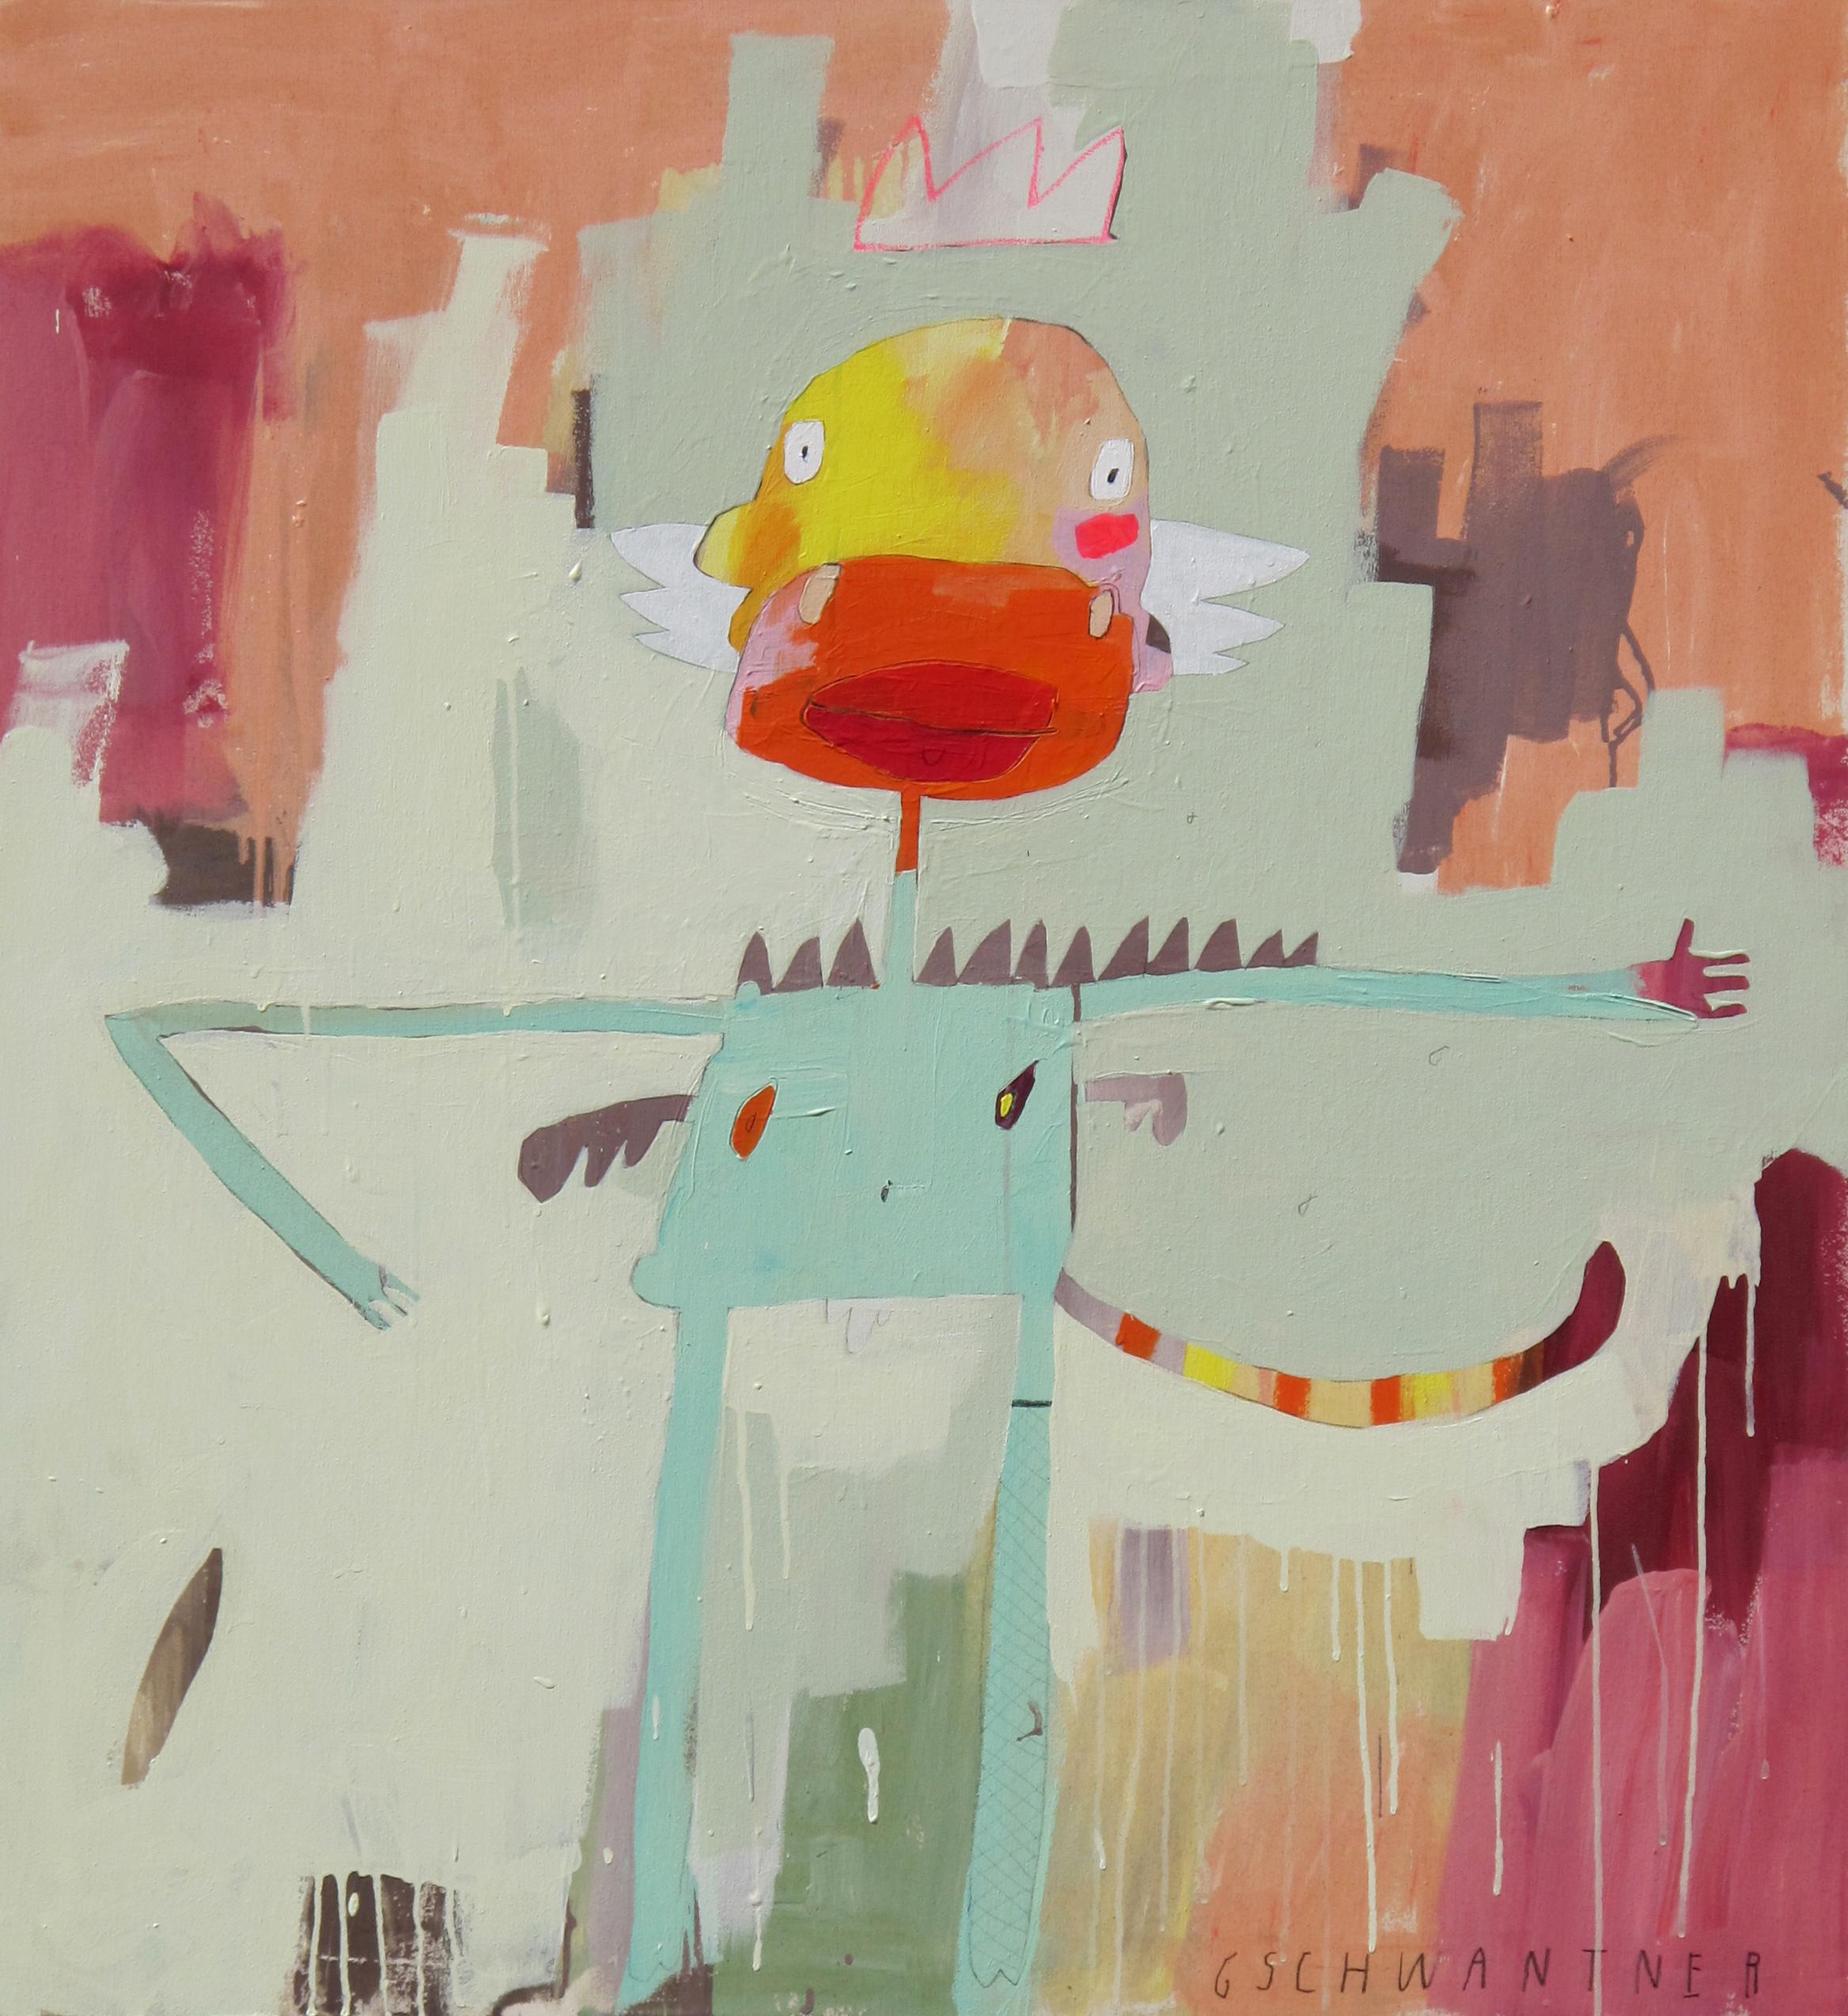 Old Monkey King, 2015, 113 x 104